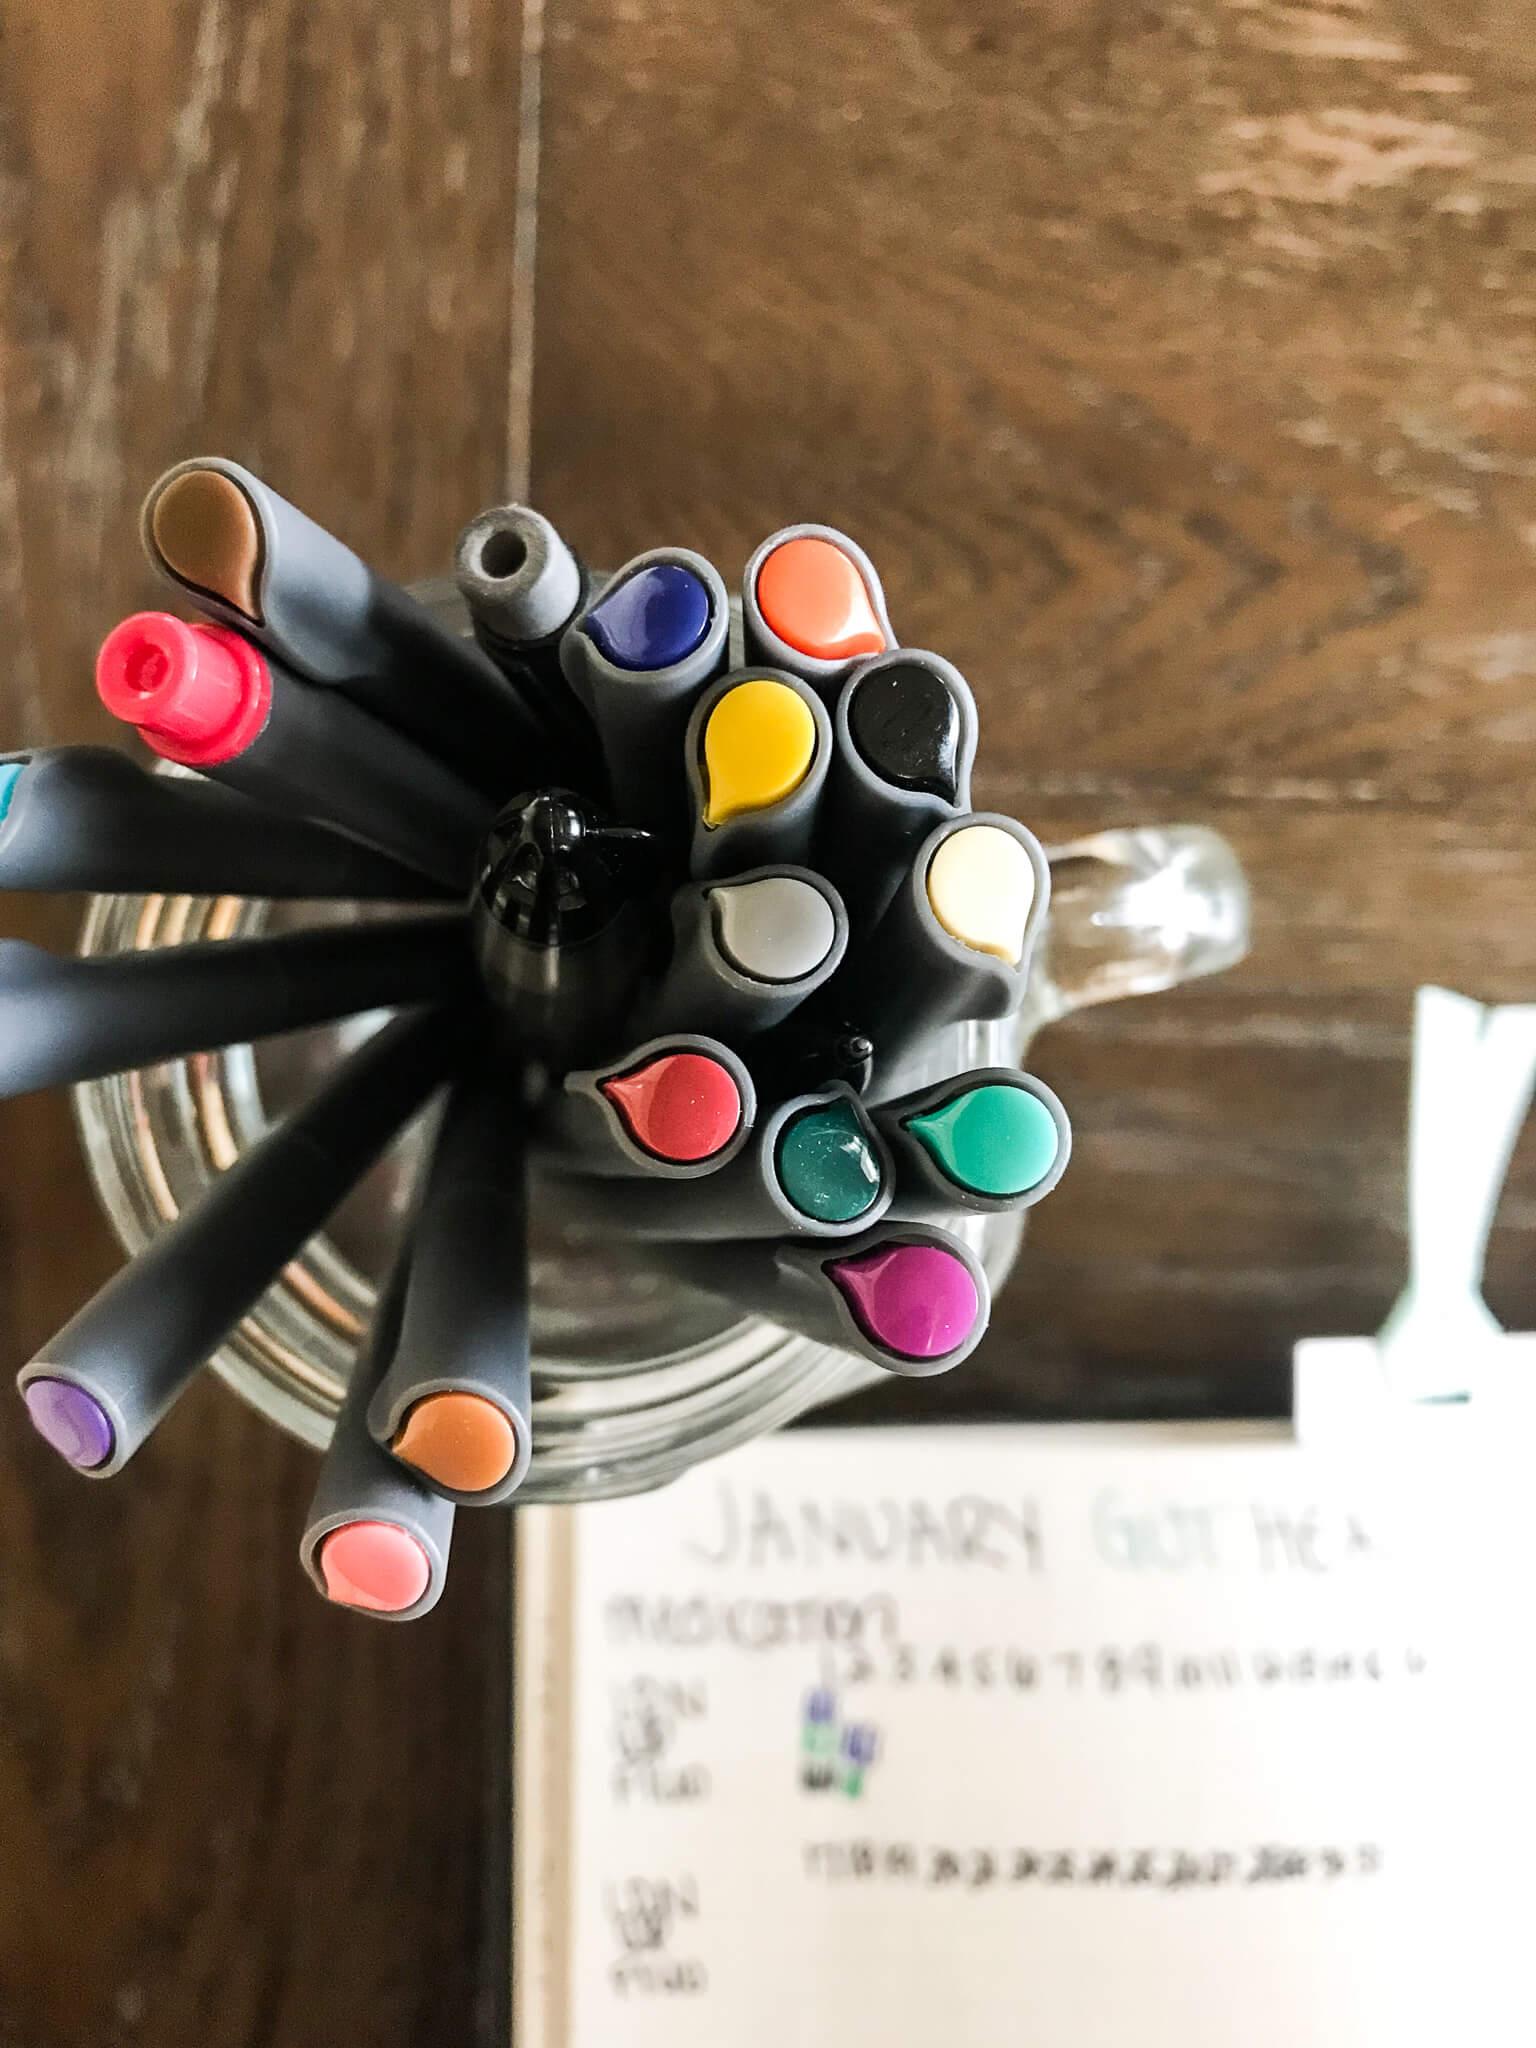 2019 Bullet Journal www.sarahkayhoffman.com #bulletjournal #bujo #healthyliving #mompreneur bujo pens